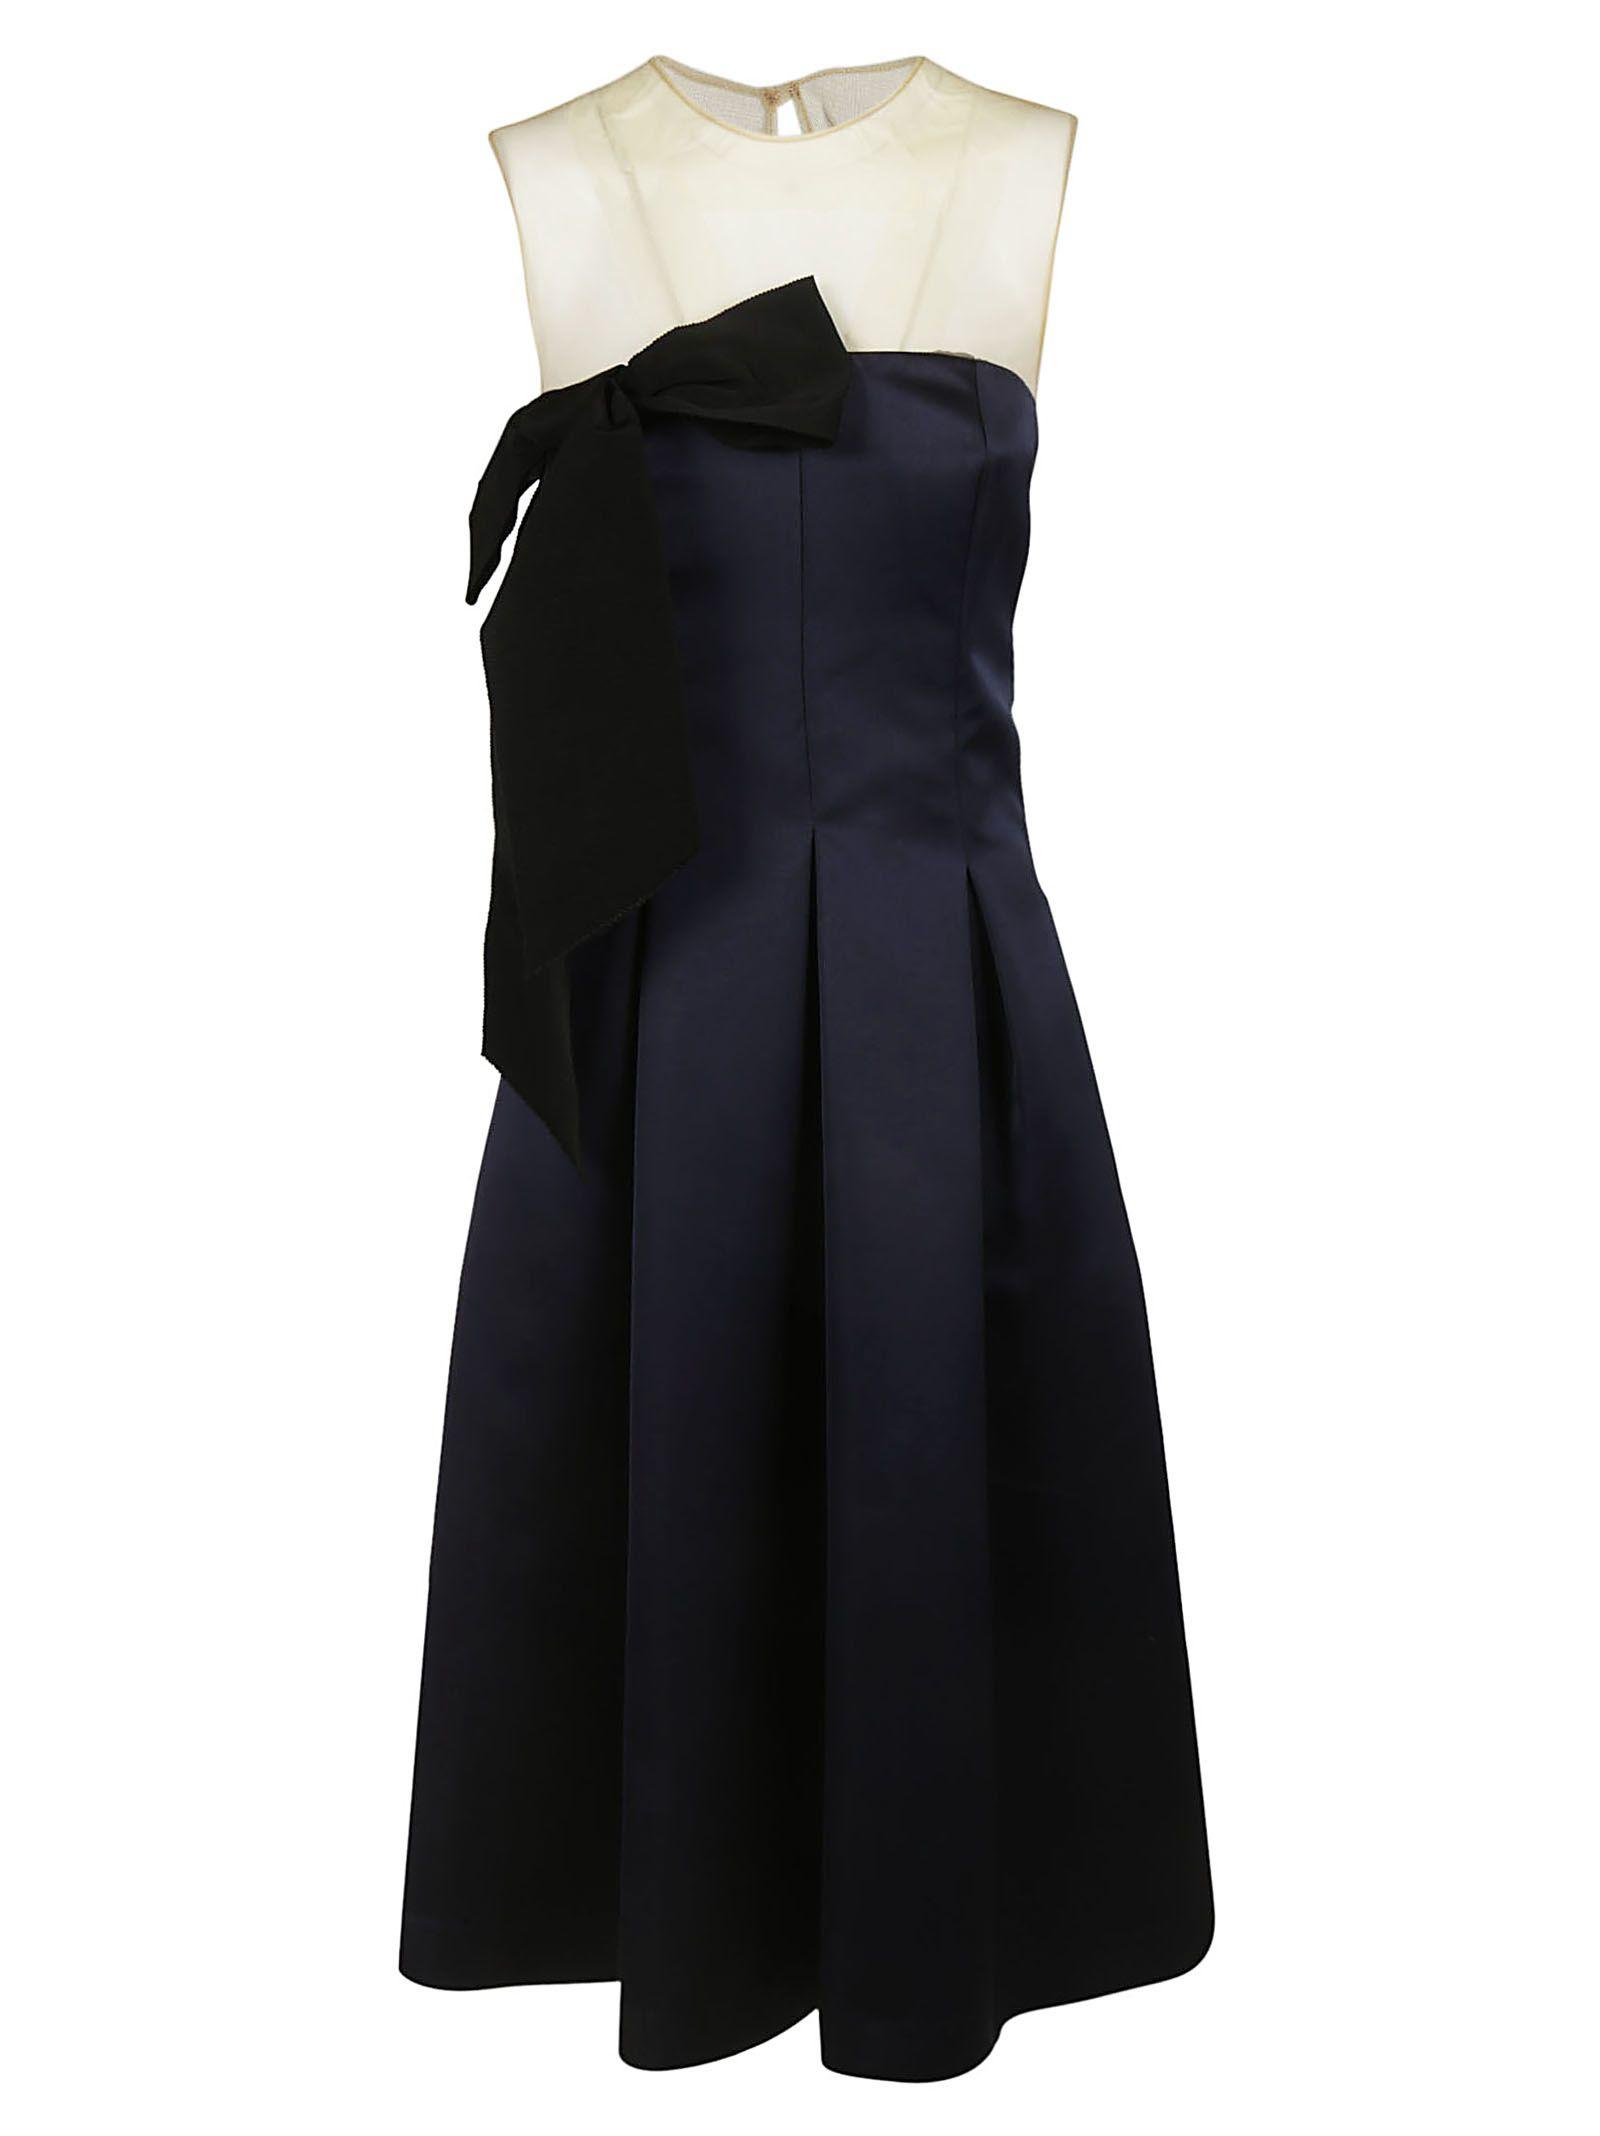 Parosh Mesh Panel Dress